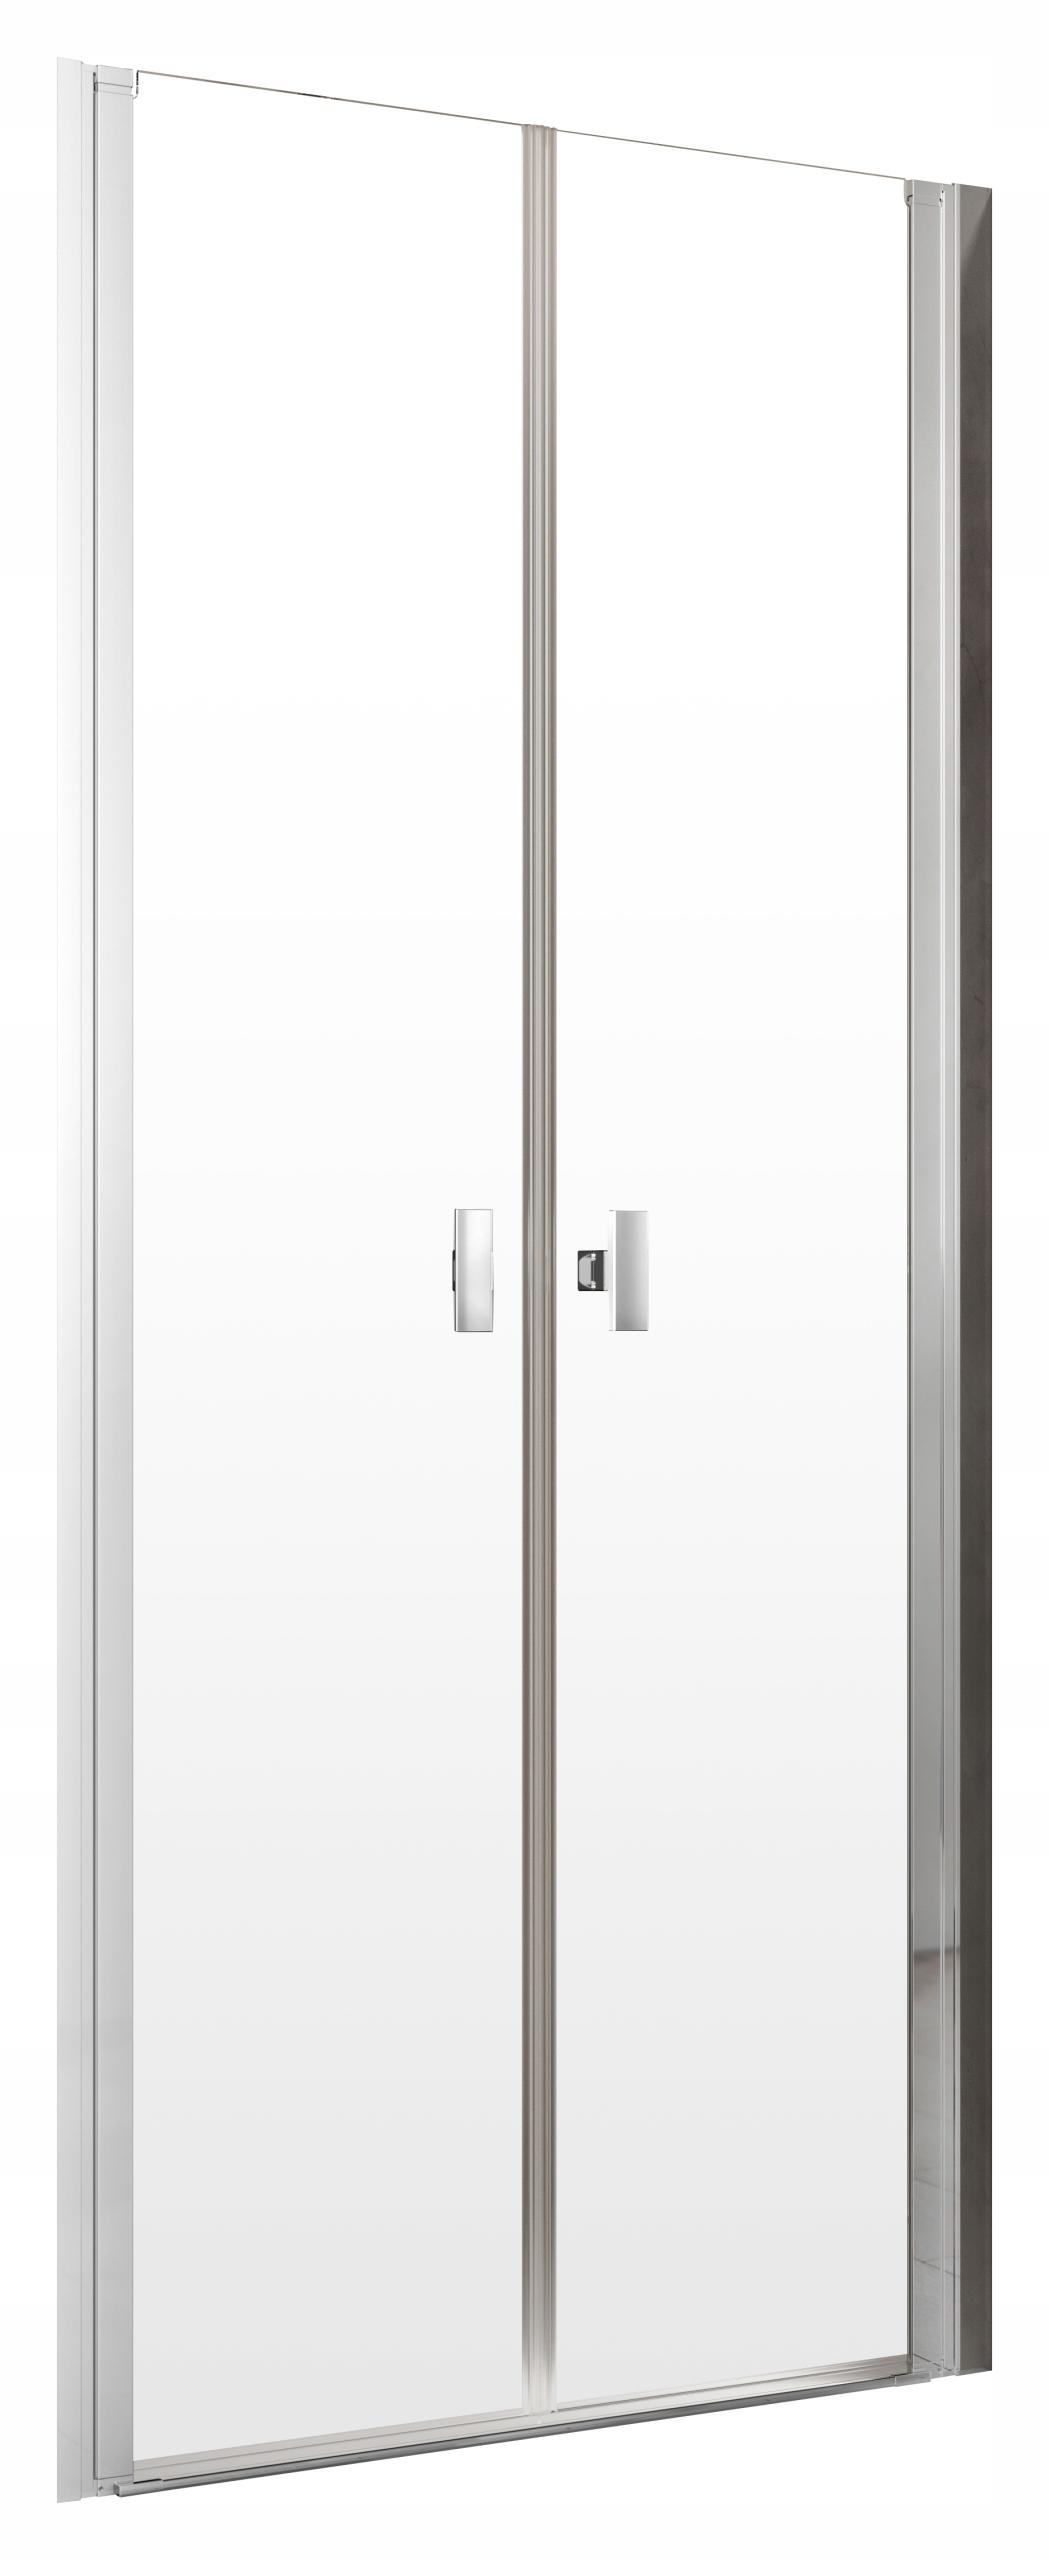 NES DWD I sprchové dvere 110x200 cm RADAWAY